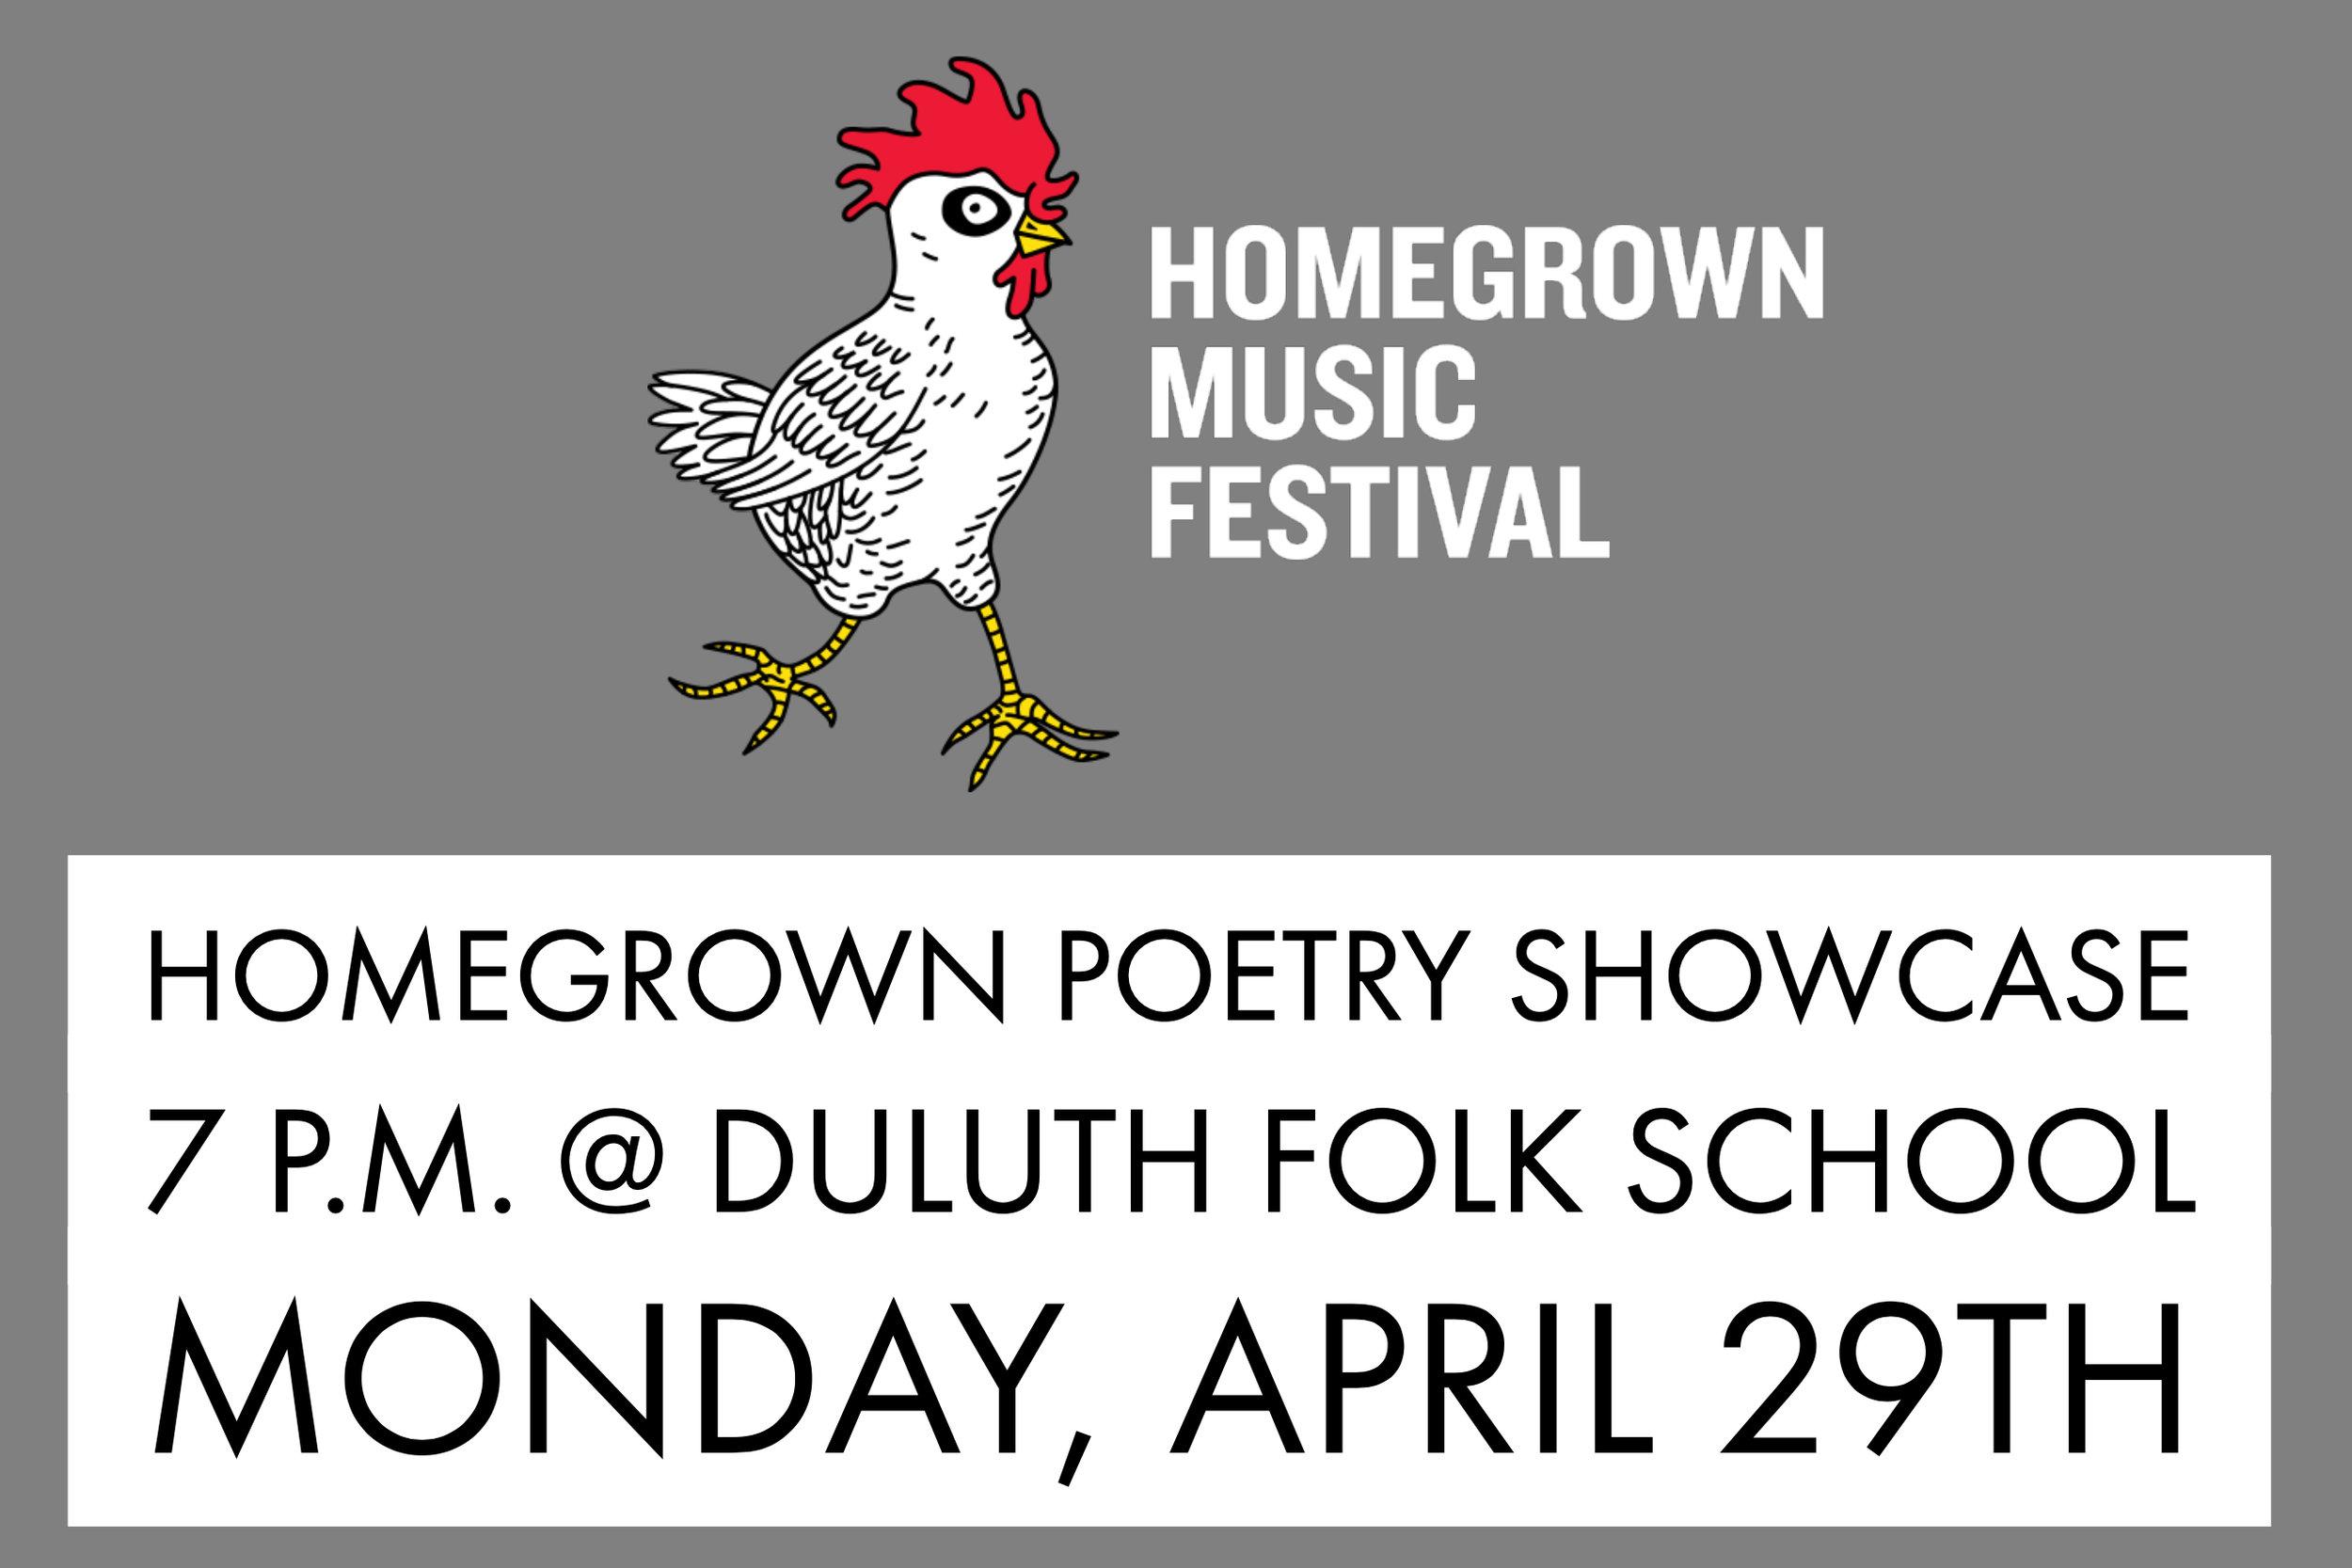 Alyssa Johnson - Homegrown Poetry Showcase - 2019 - Duluth, Minnesota